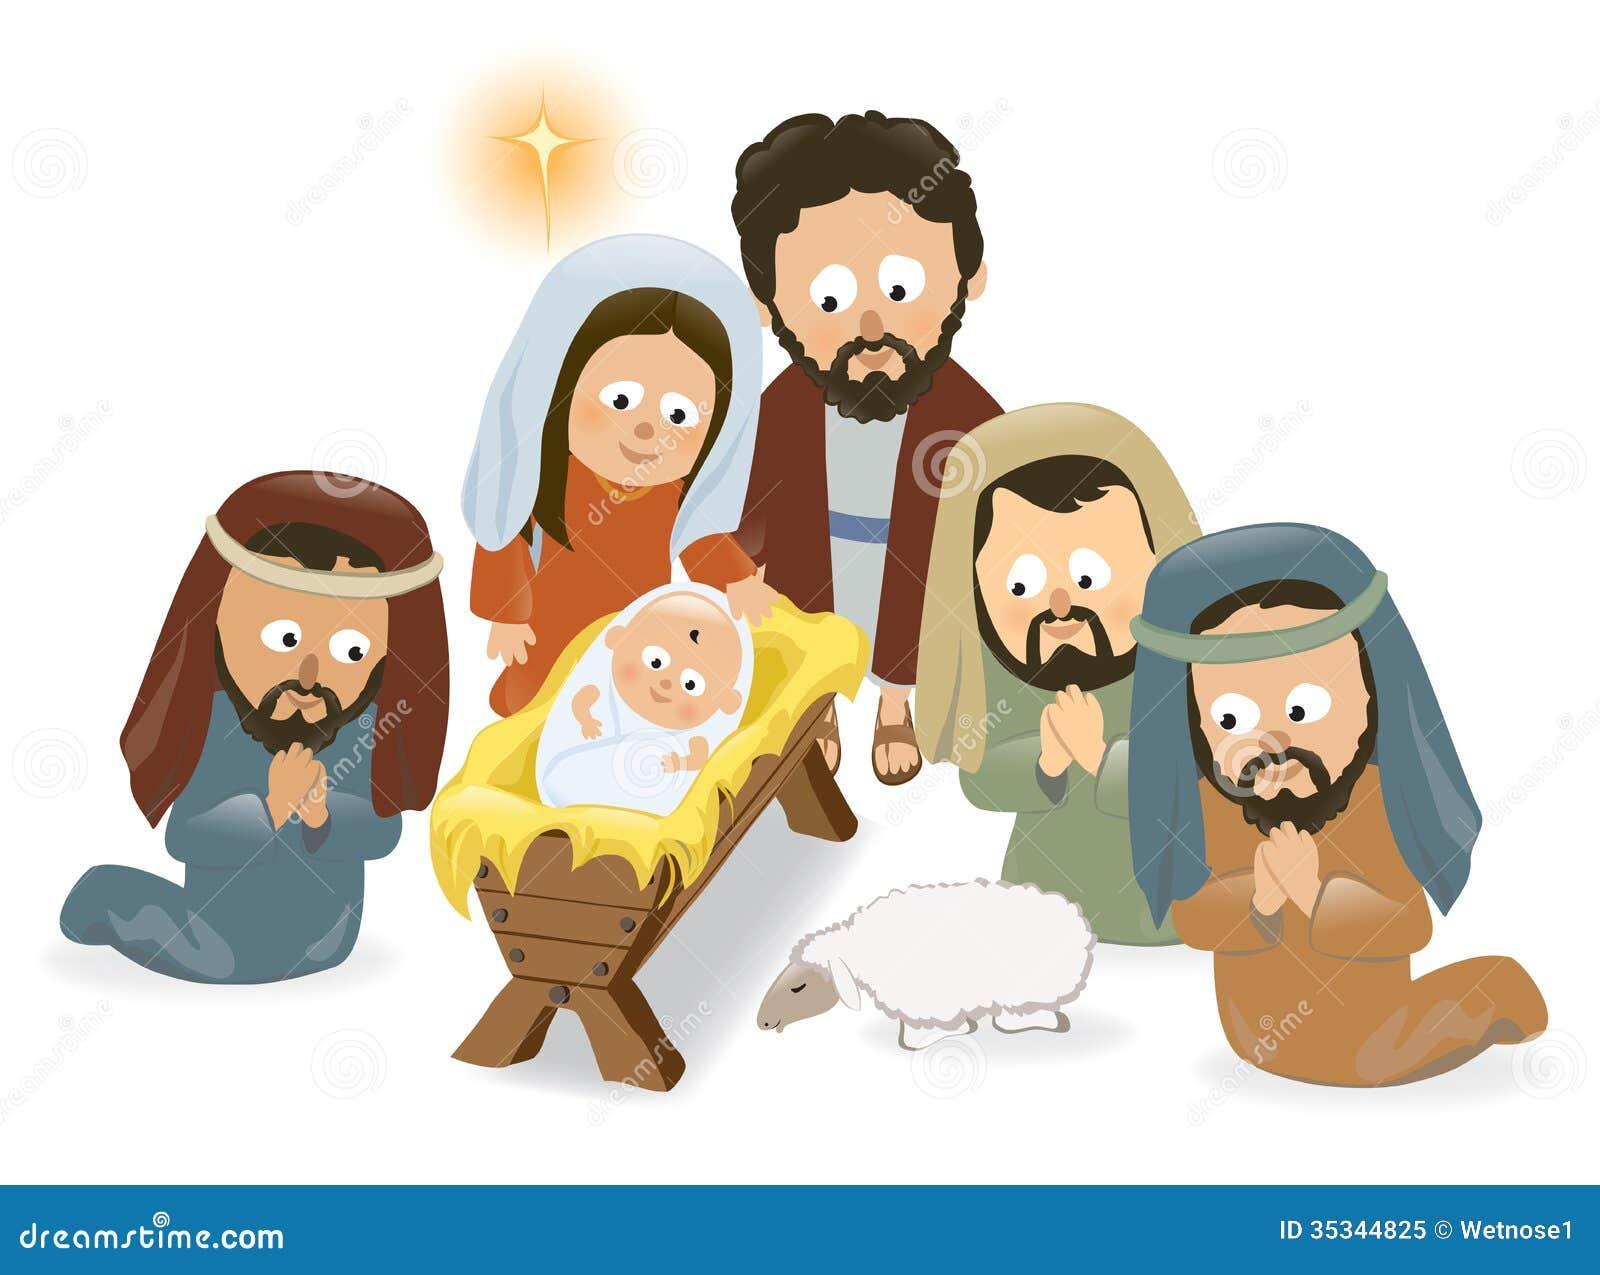 Nativity Scene Royalty Free Stock Photo - Image: 35344825